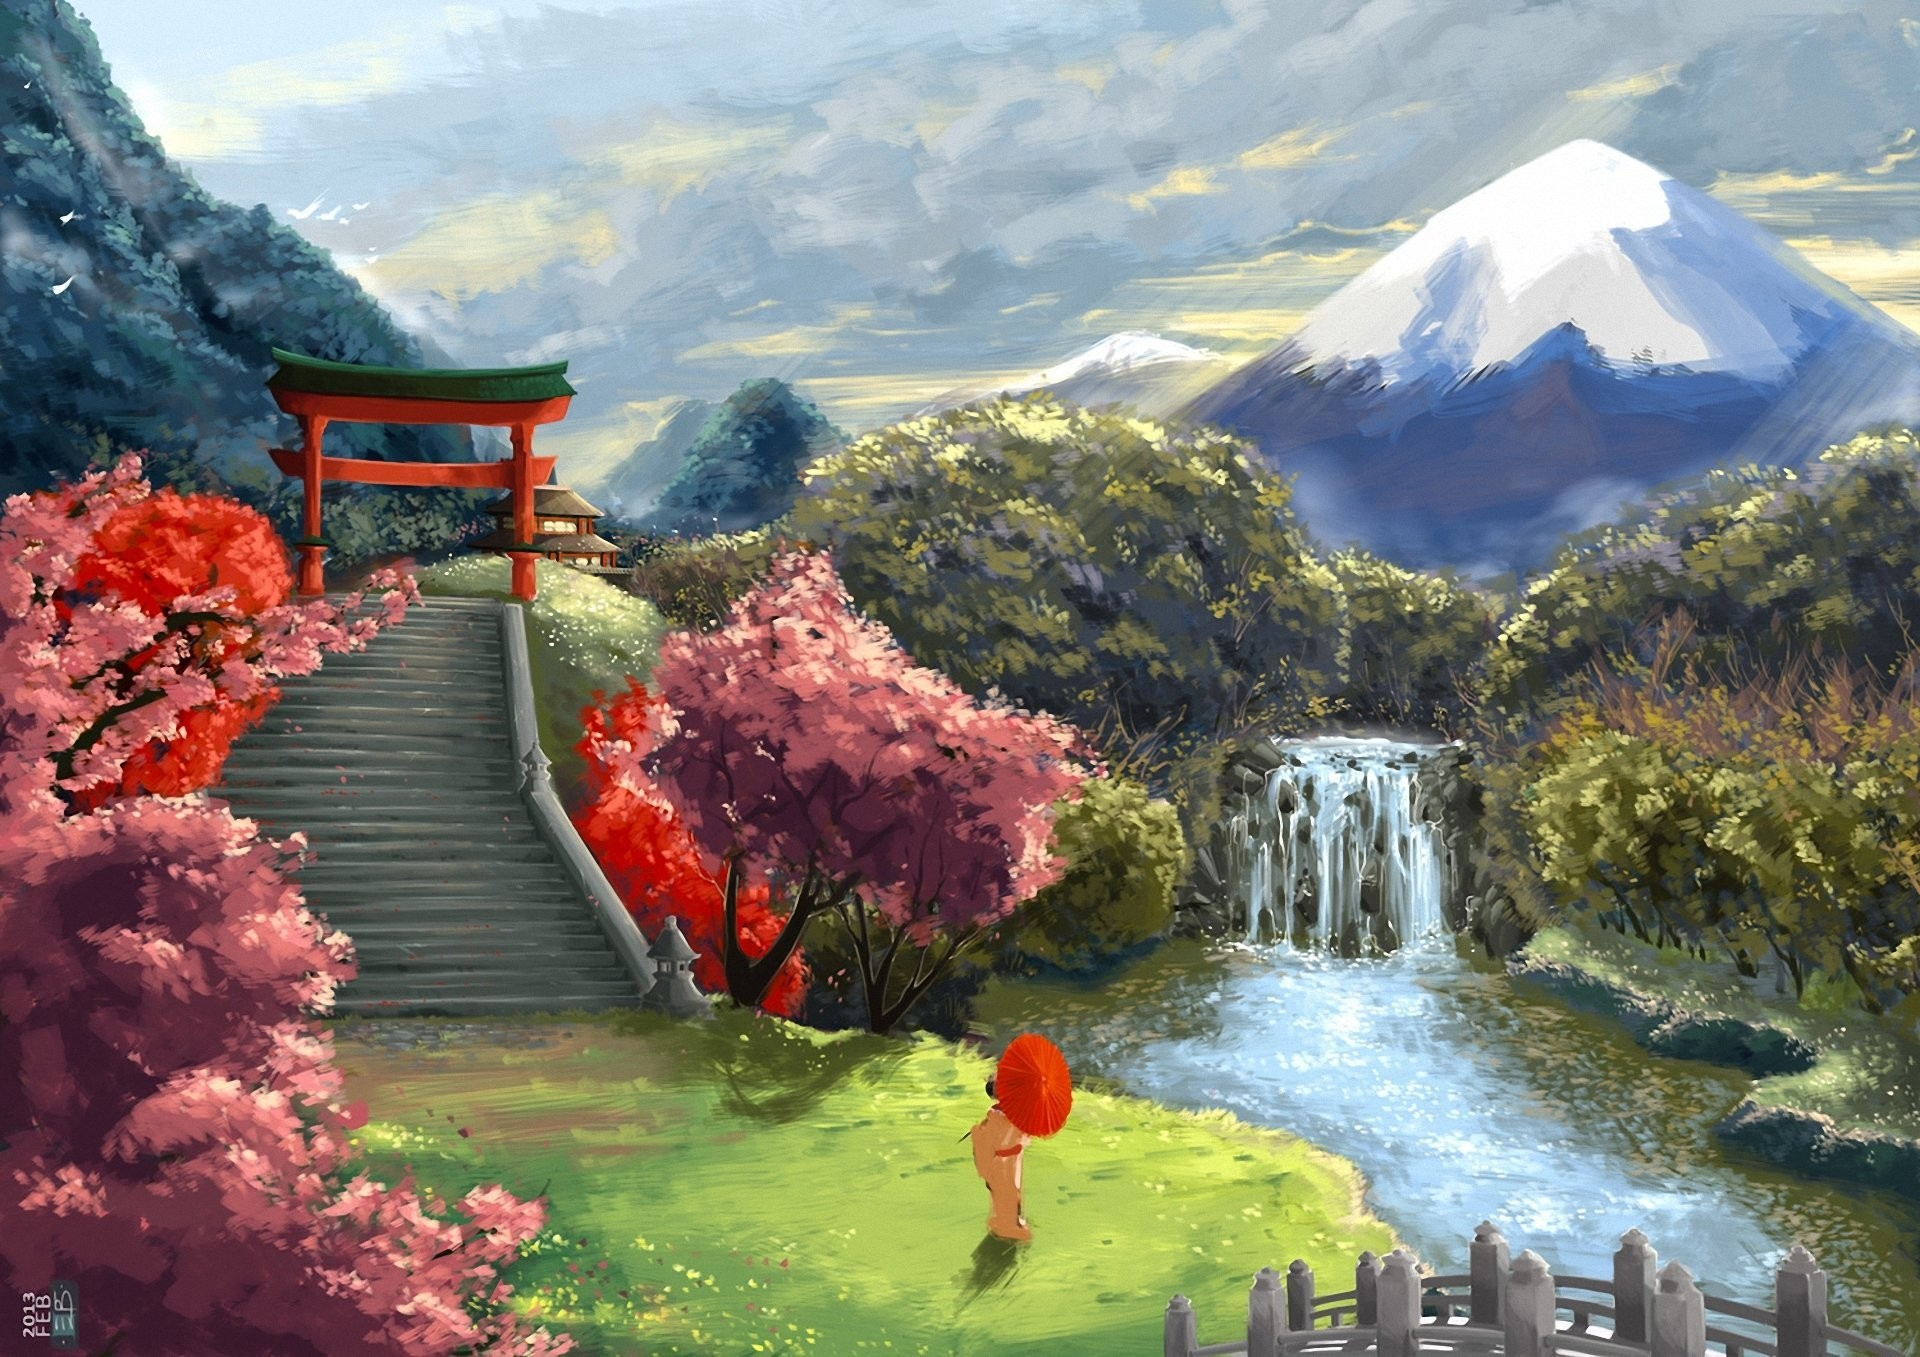 art landscape asia geisha umbrella sakura stairs gate mountain waterfall  river